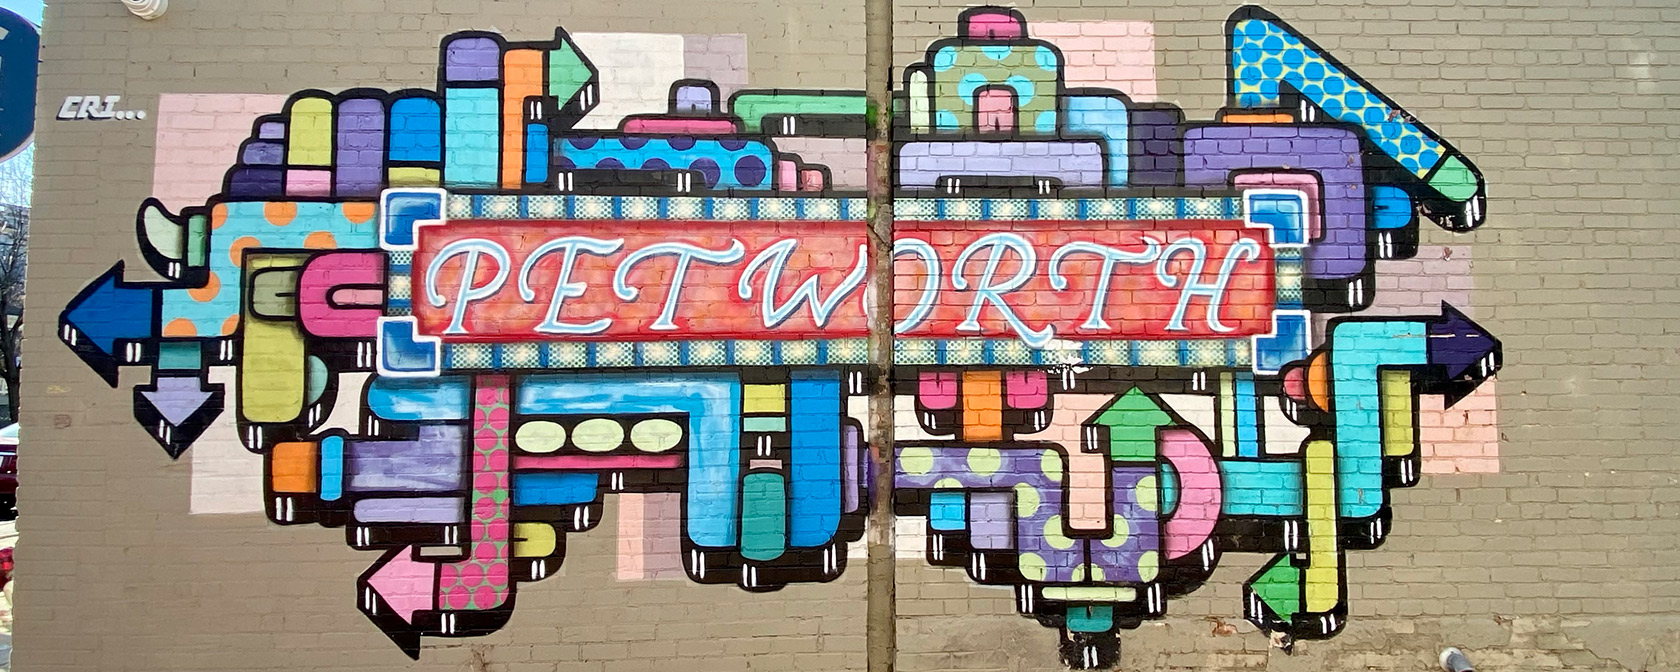 Petworth Mural | Visit Petworth neighborhood